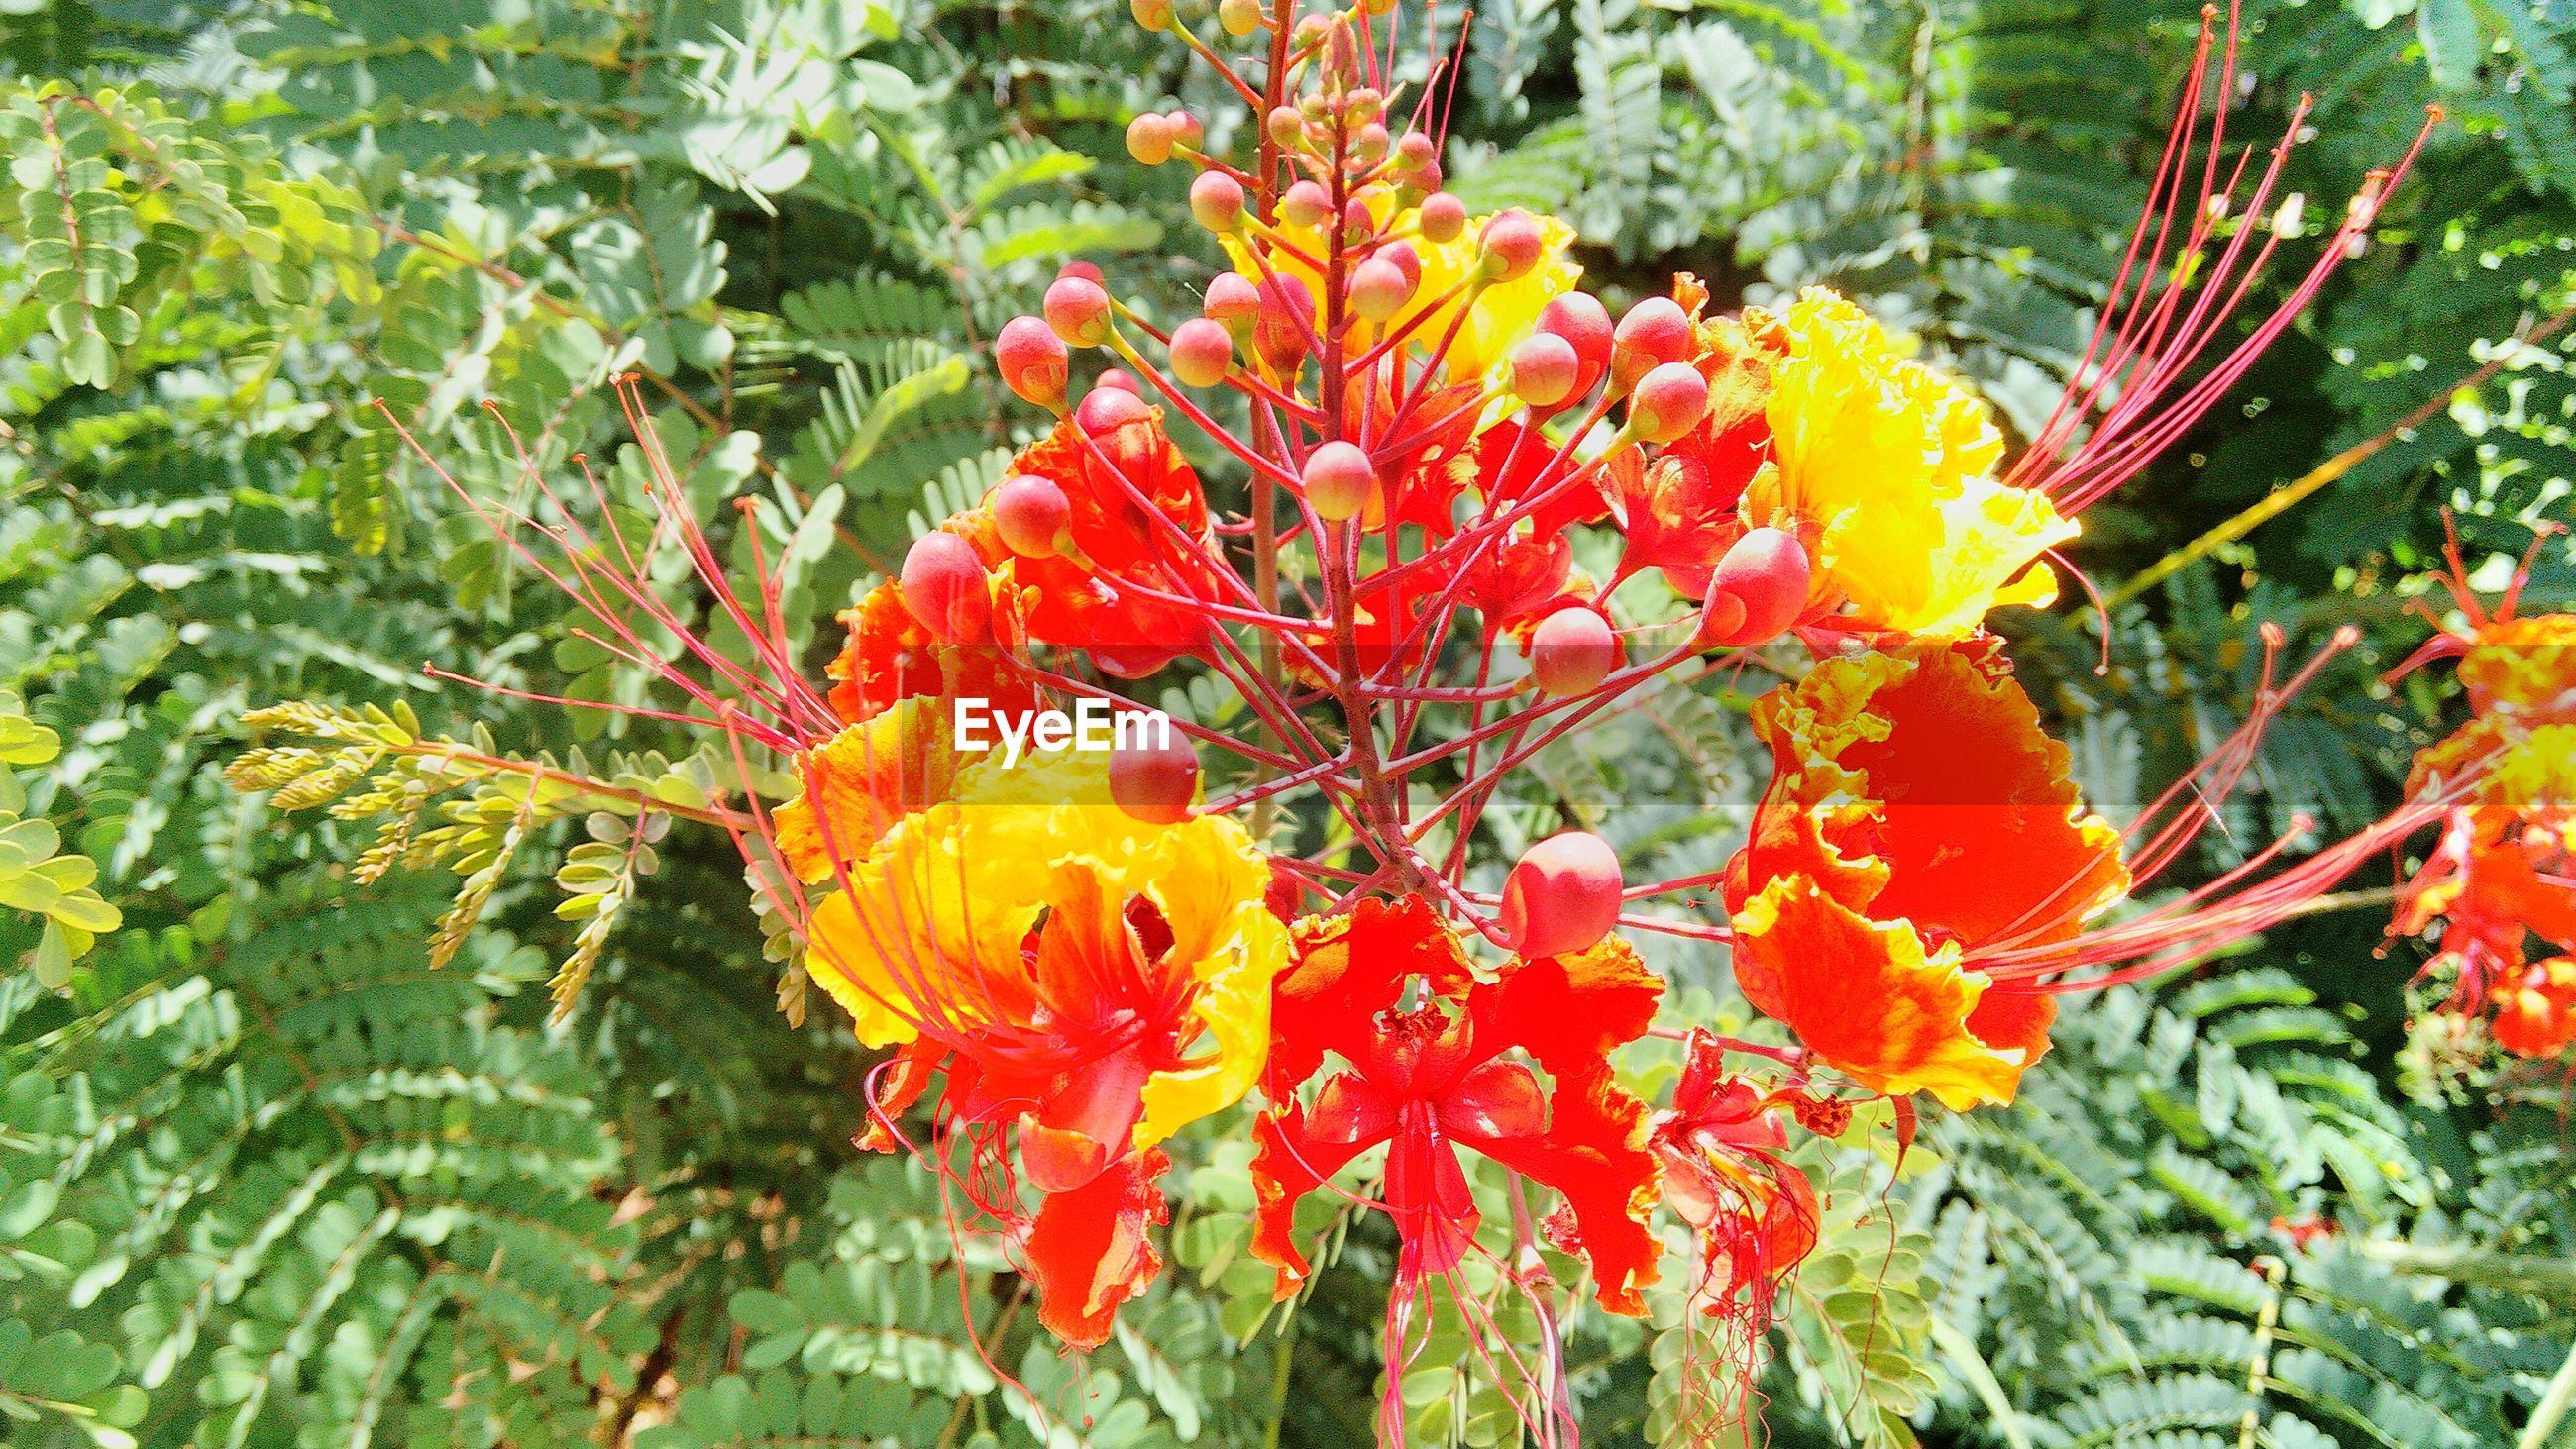 Delonix regia blooming outdoors